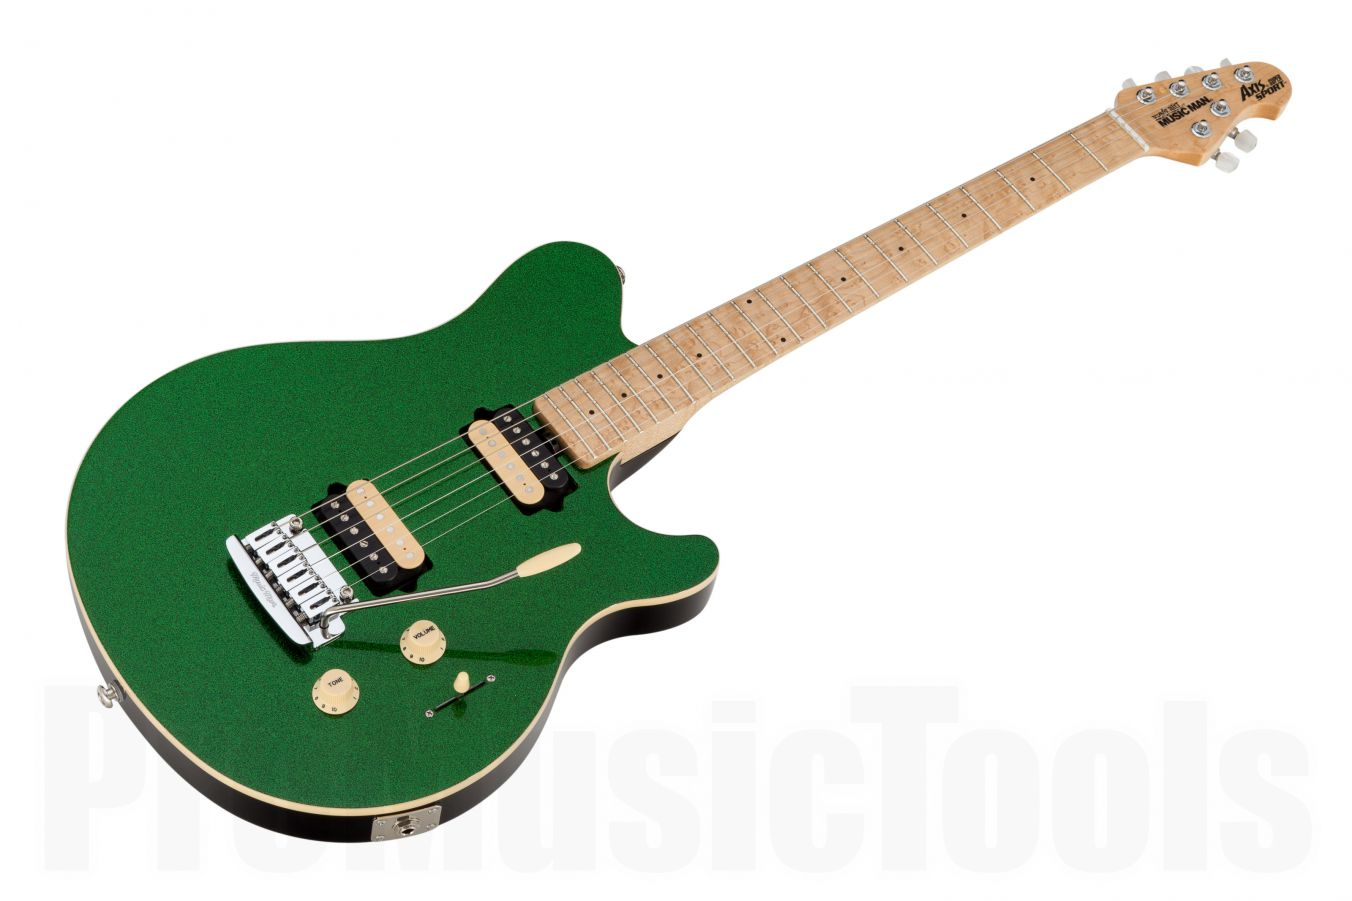 Music Man USA Axis Super Sport Trem ES - PDN Emerald Green Sparkle Limited Edition MN